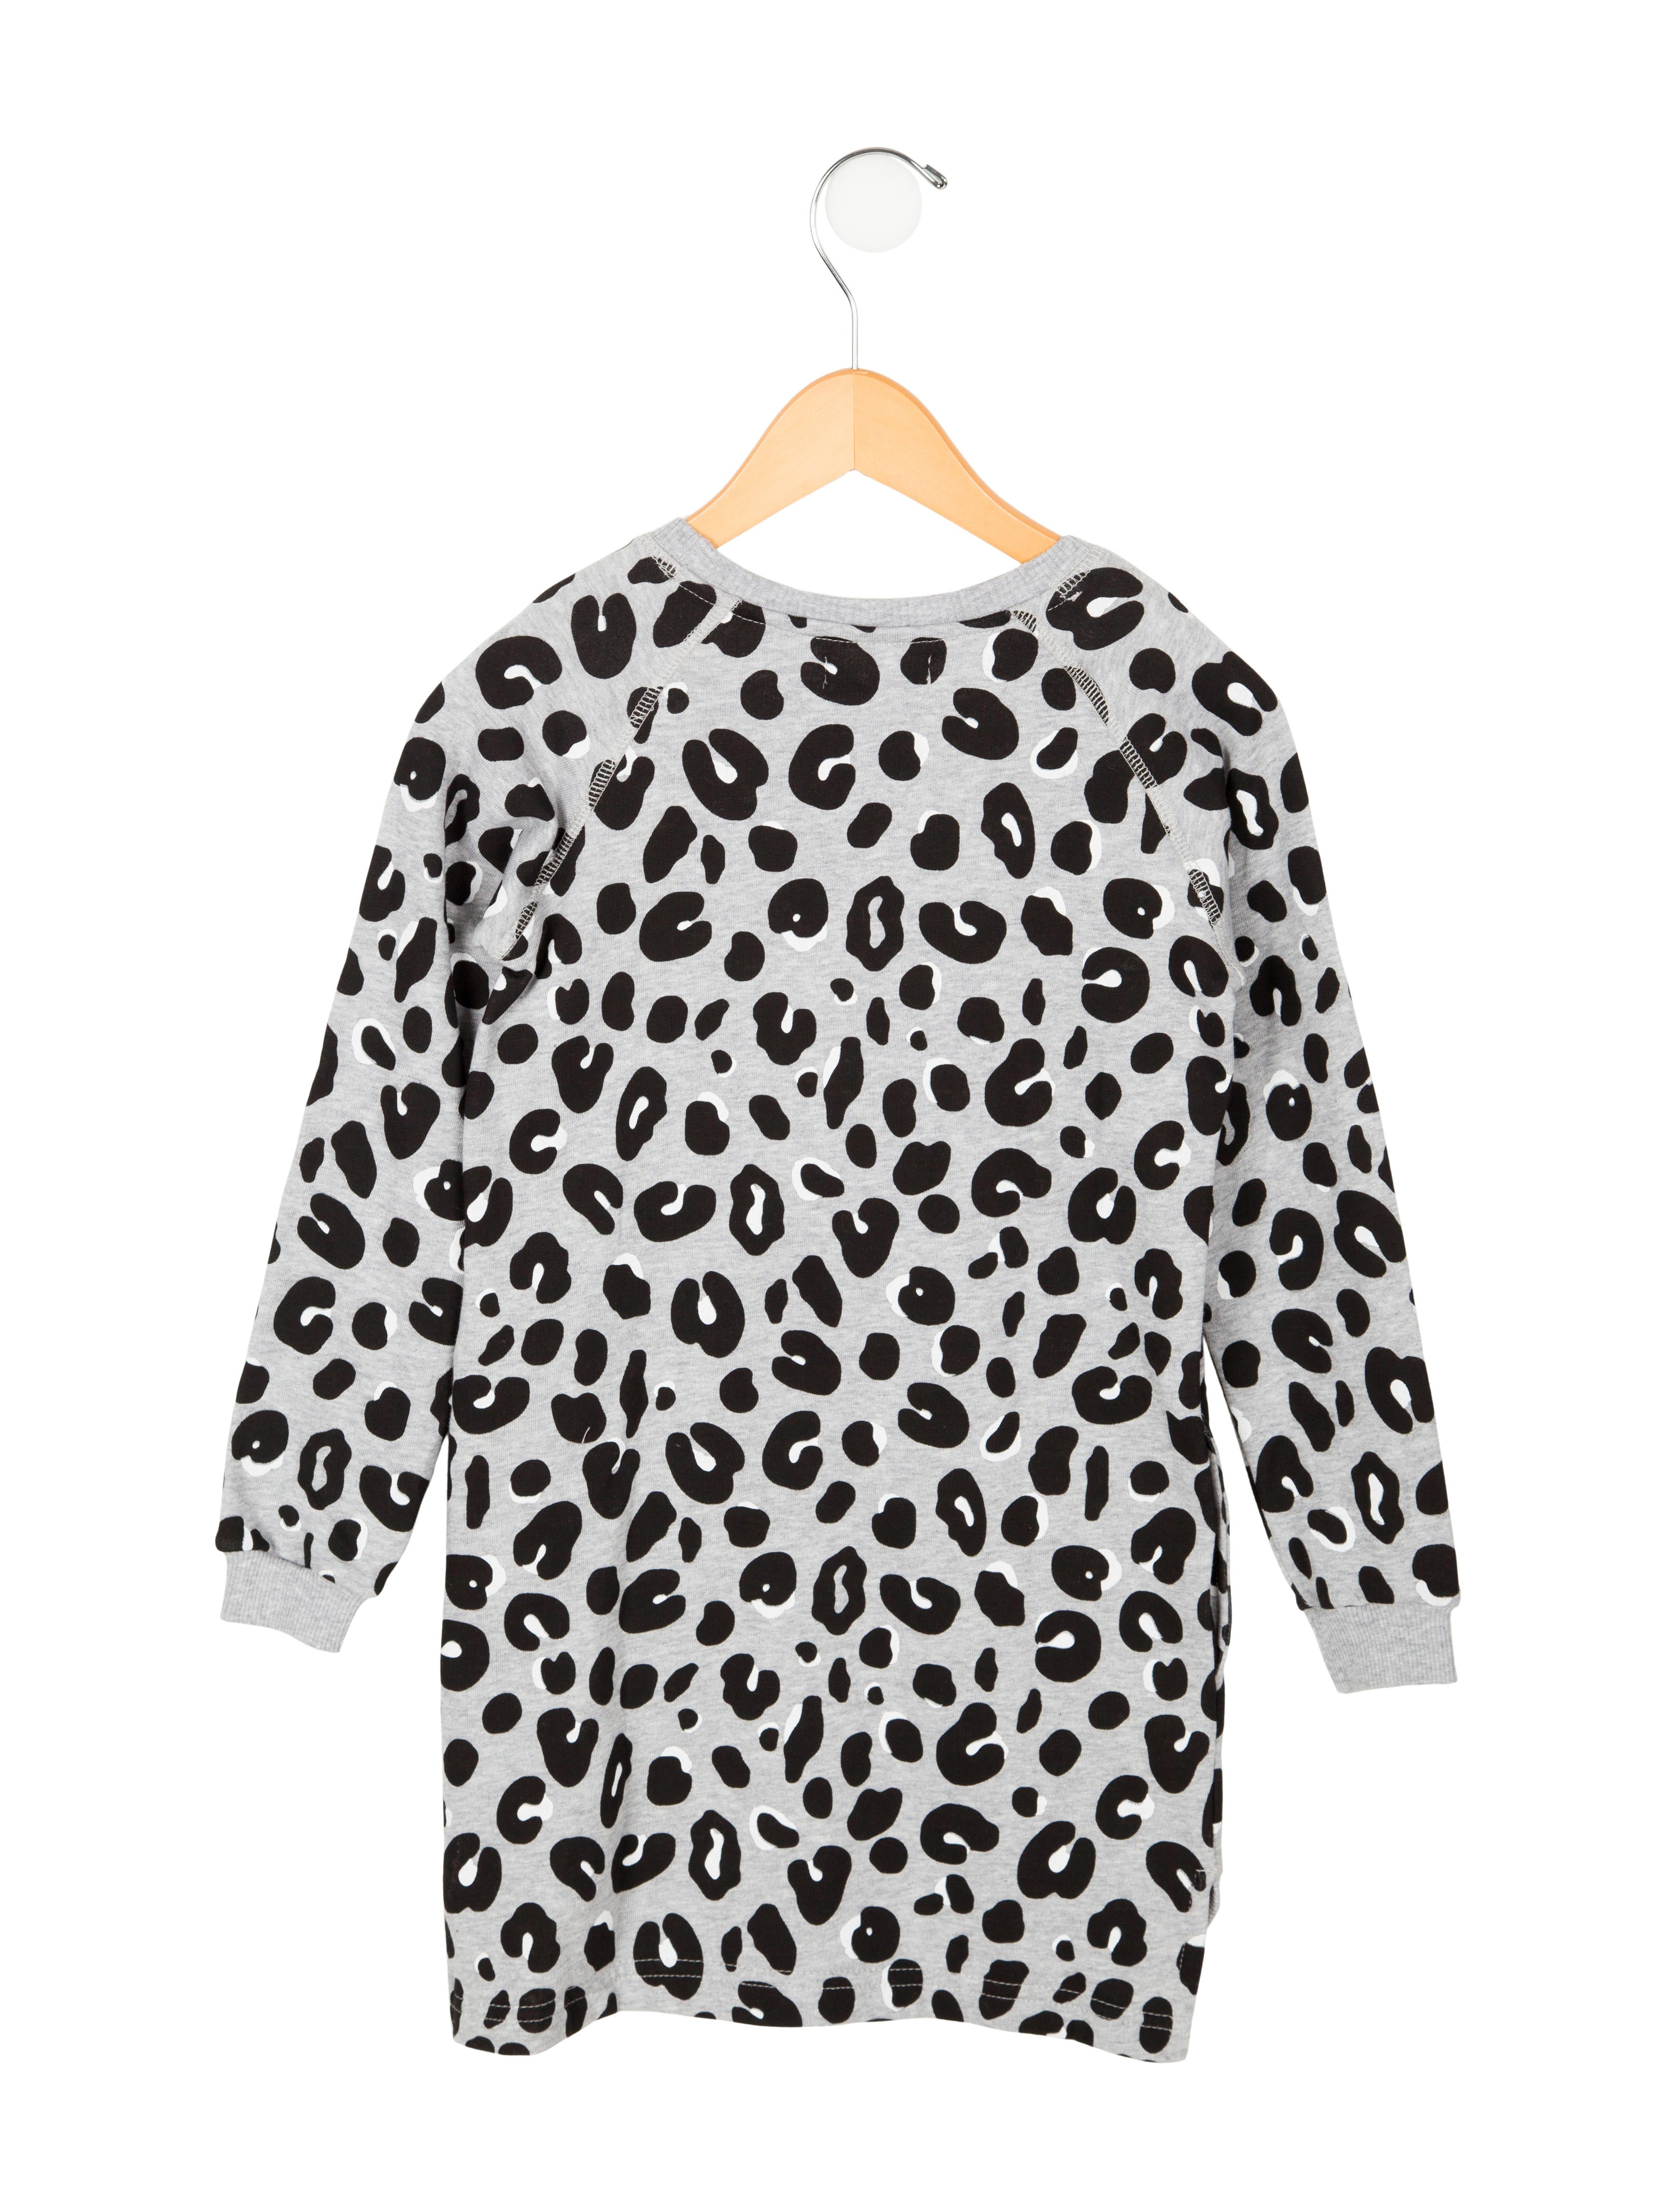 Cheetah print clothing for women